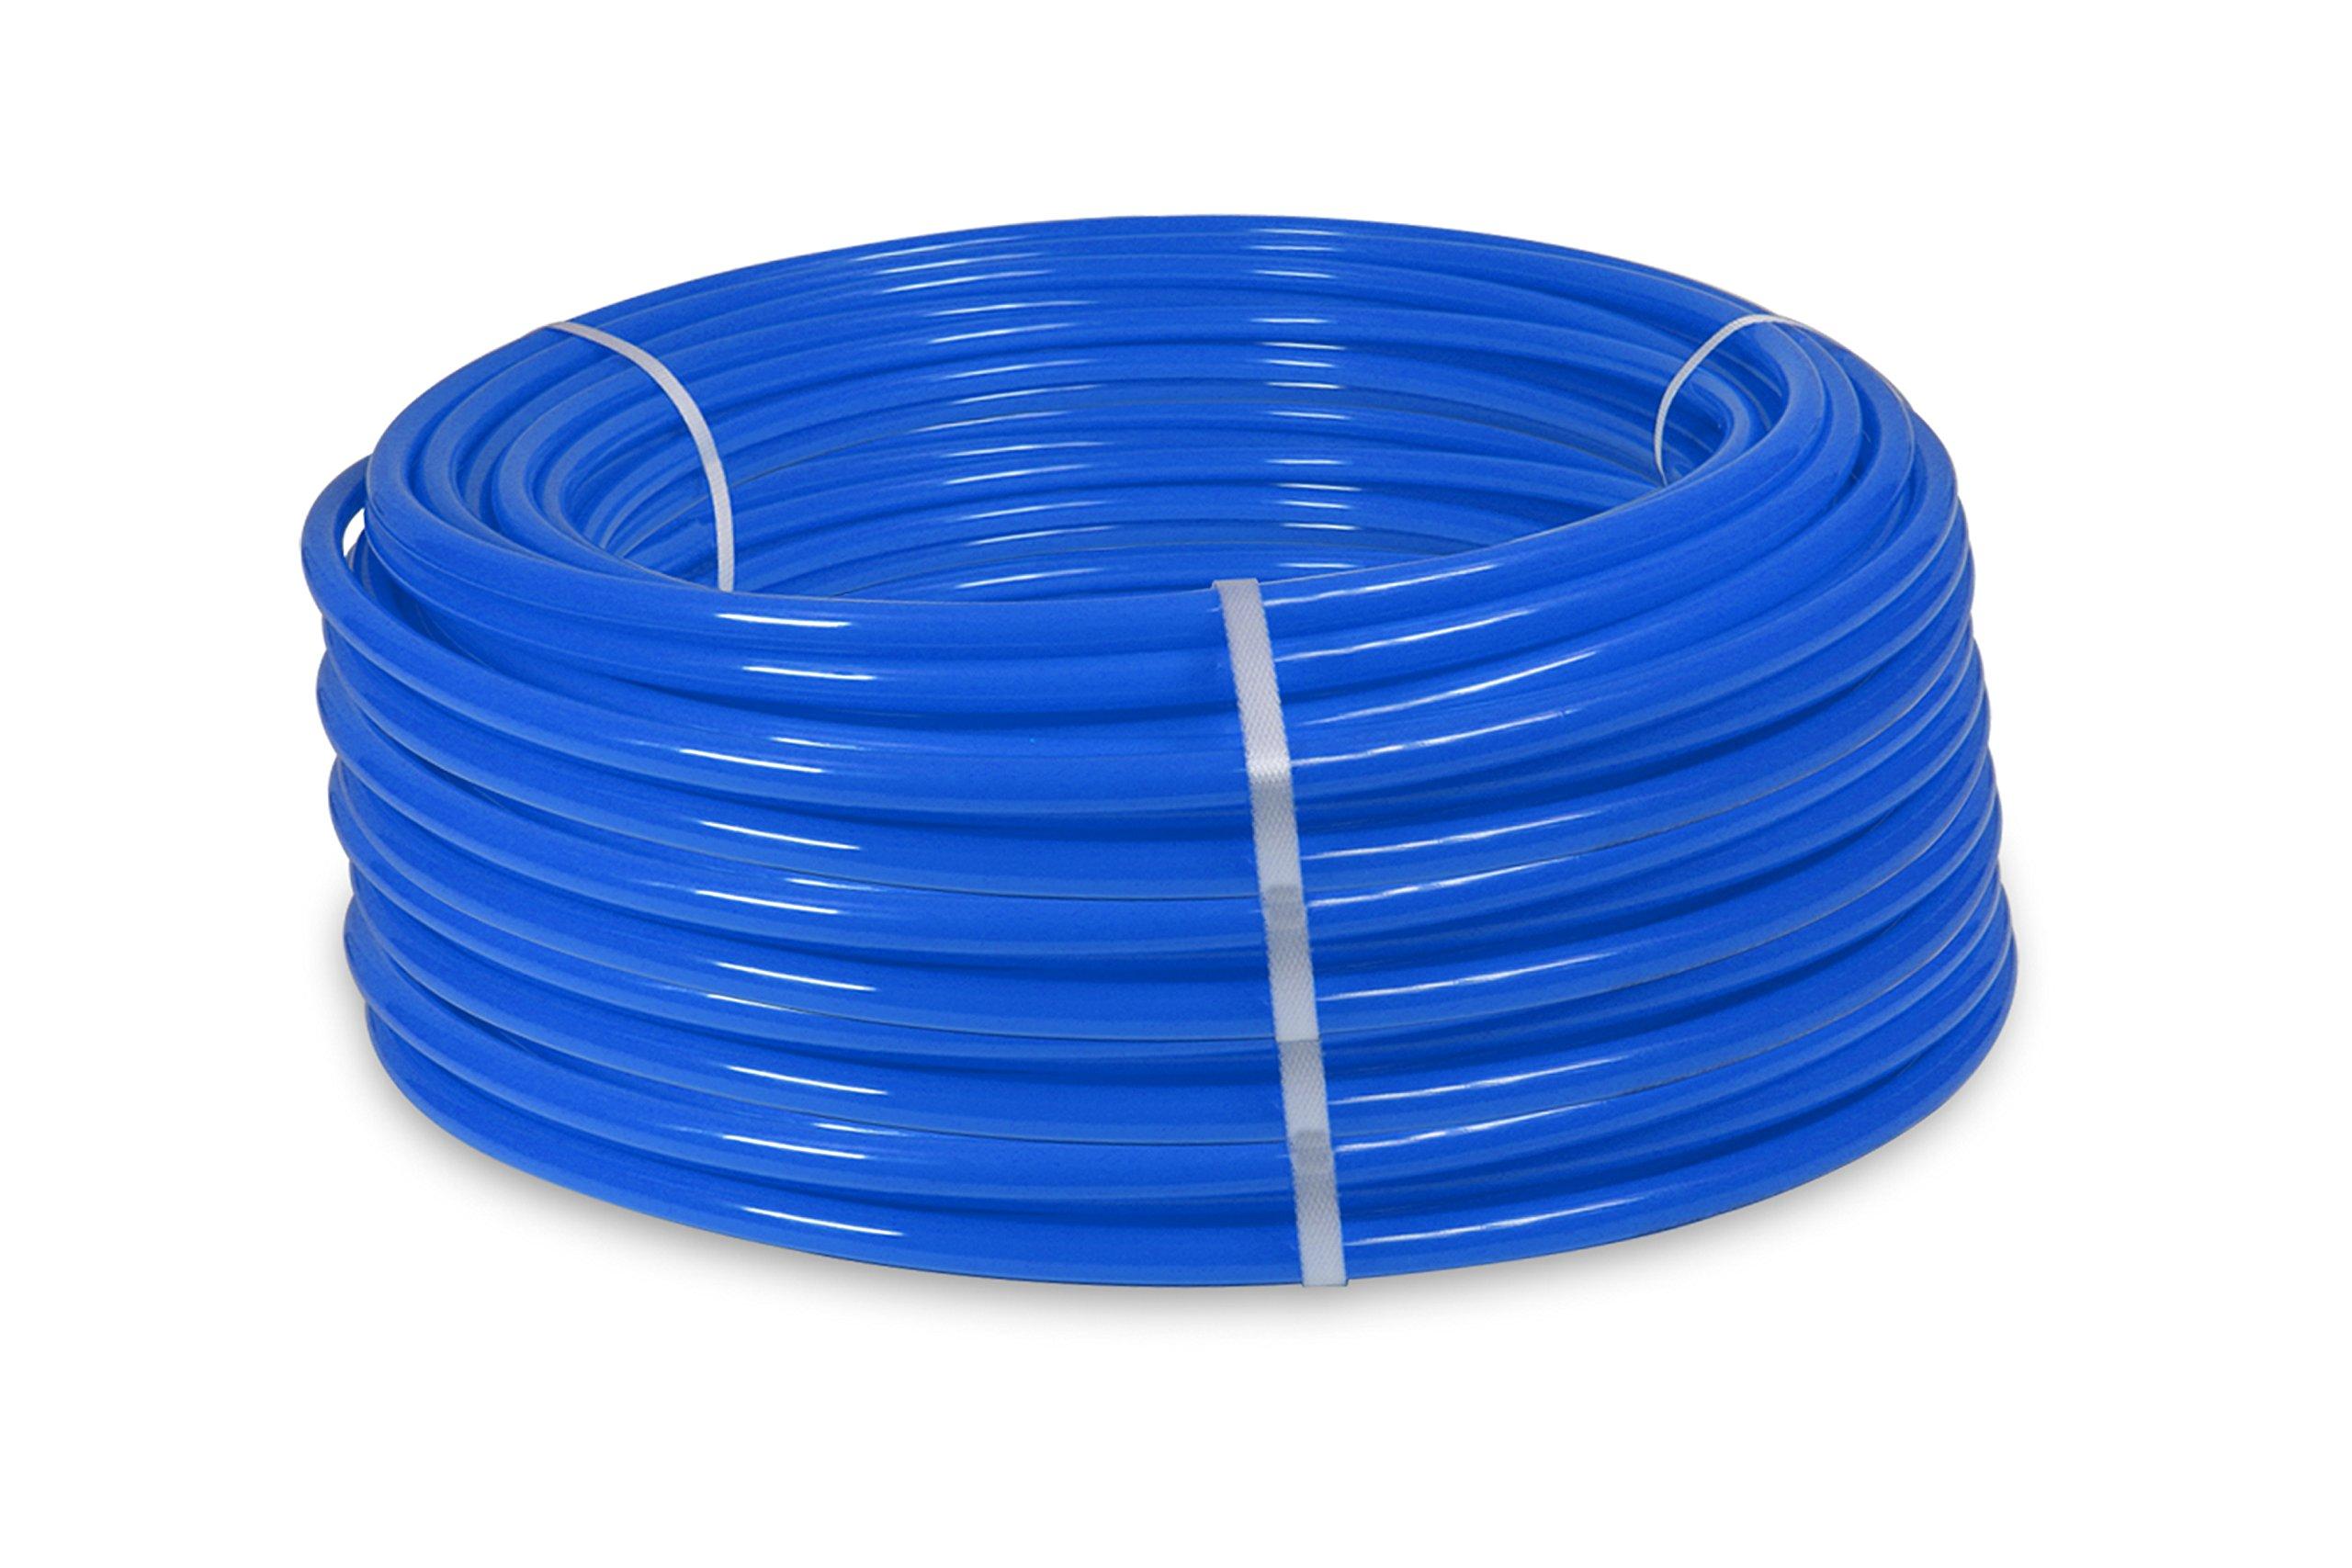 Pexflow PFW-B34500 Potable Water Pex tubing, 3/4 Inch, Blue by PEXFLOW